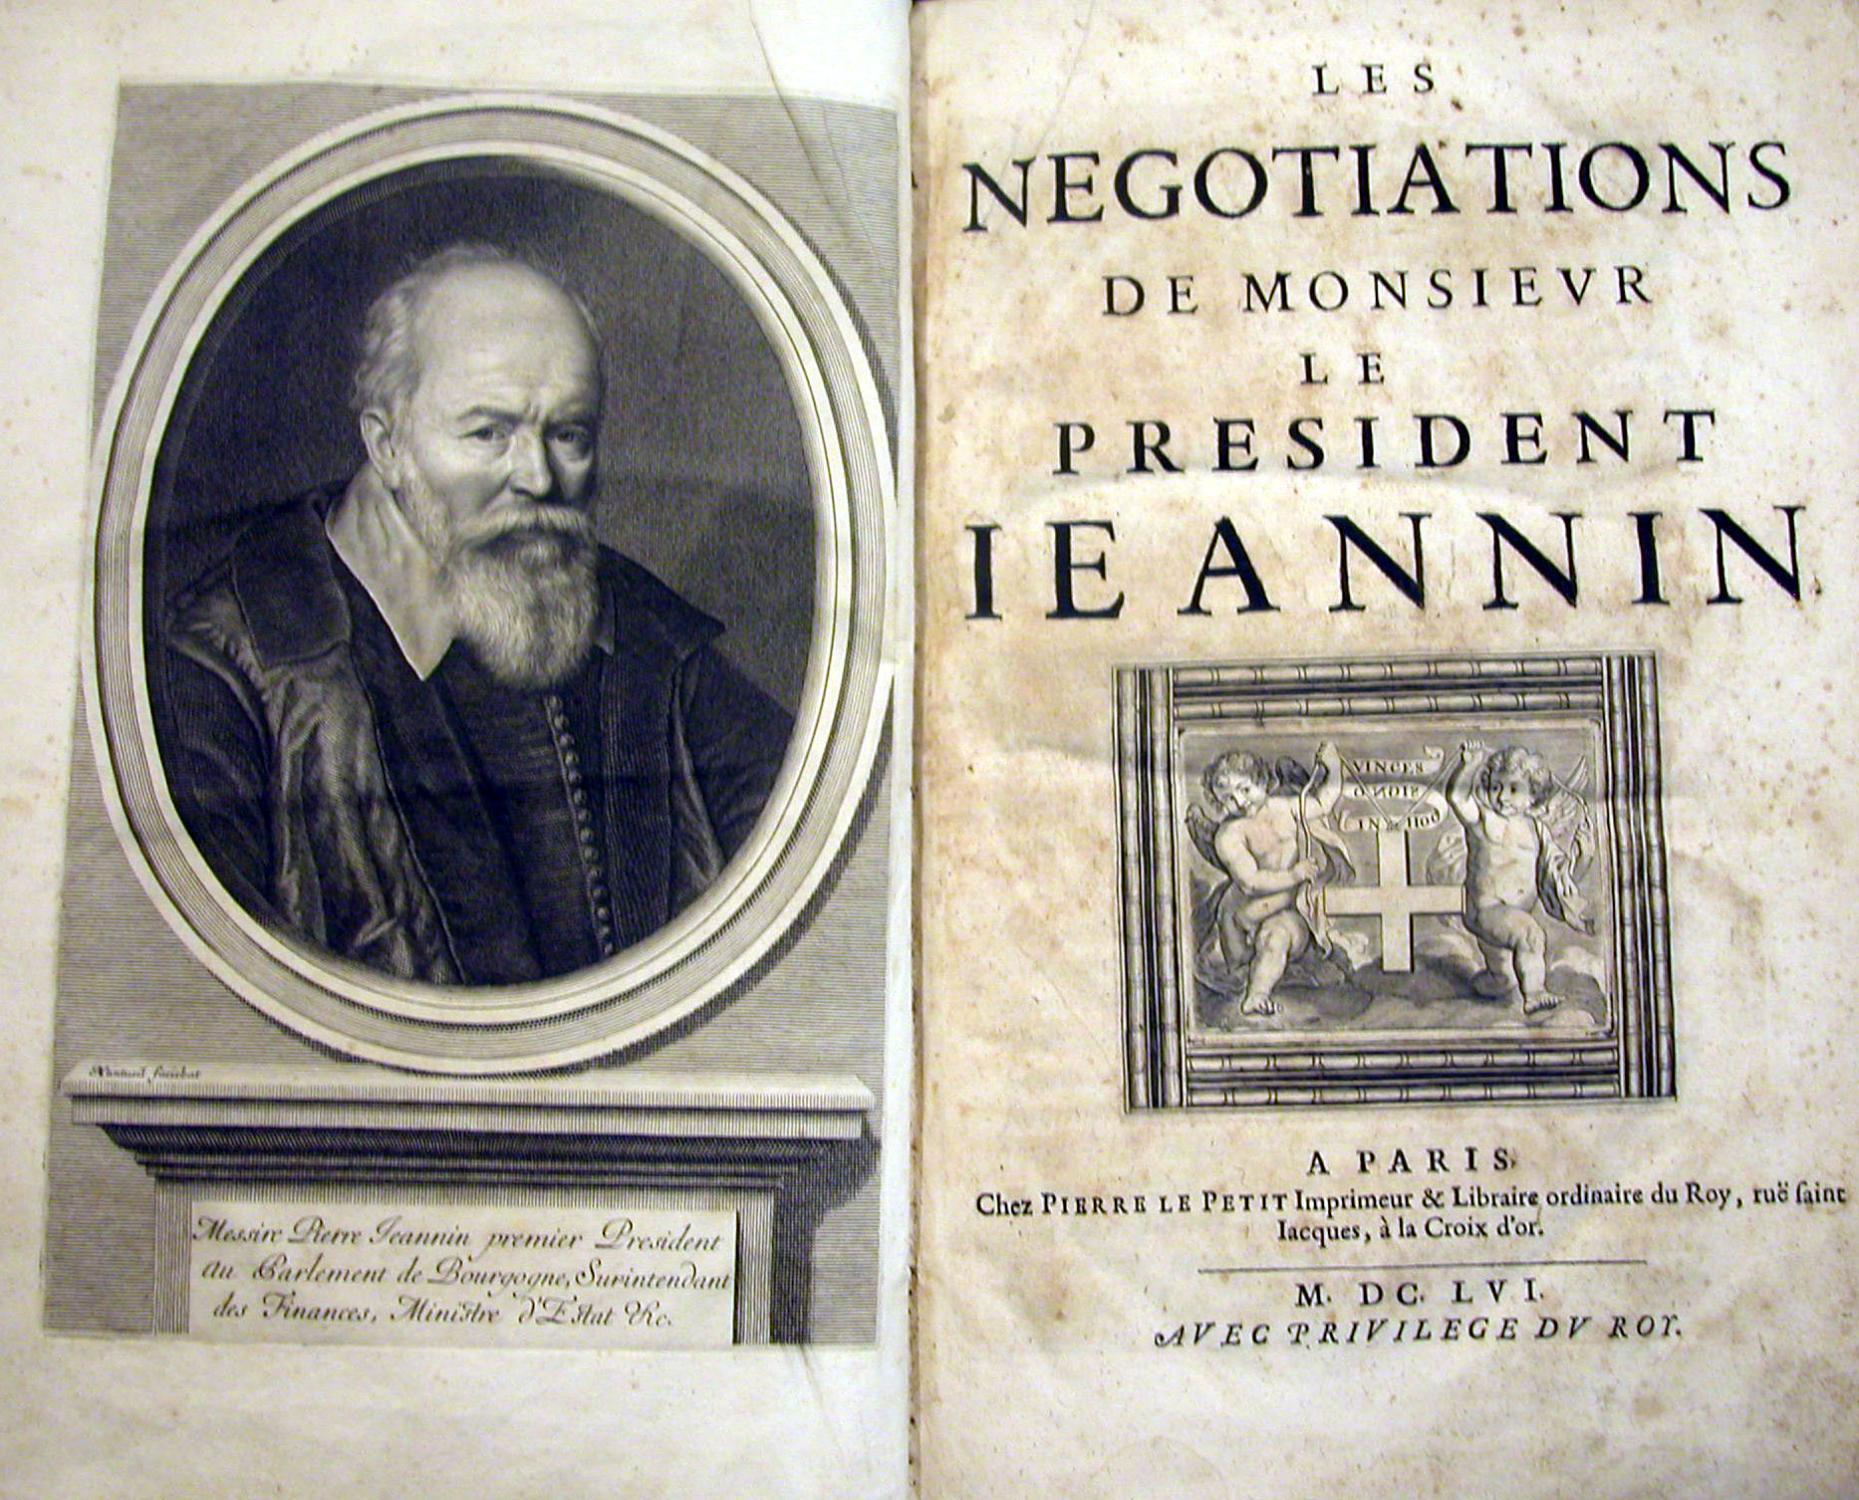 LES NEGOTIATIONS DE MONSIEUR PRESIDENT IEANNIN.: JEANNIN Pierre.